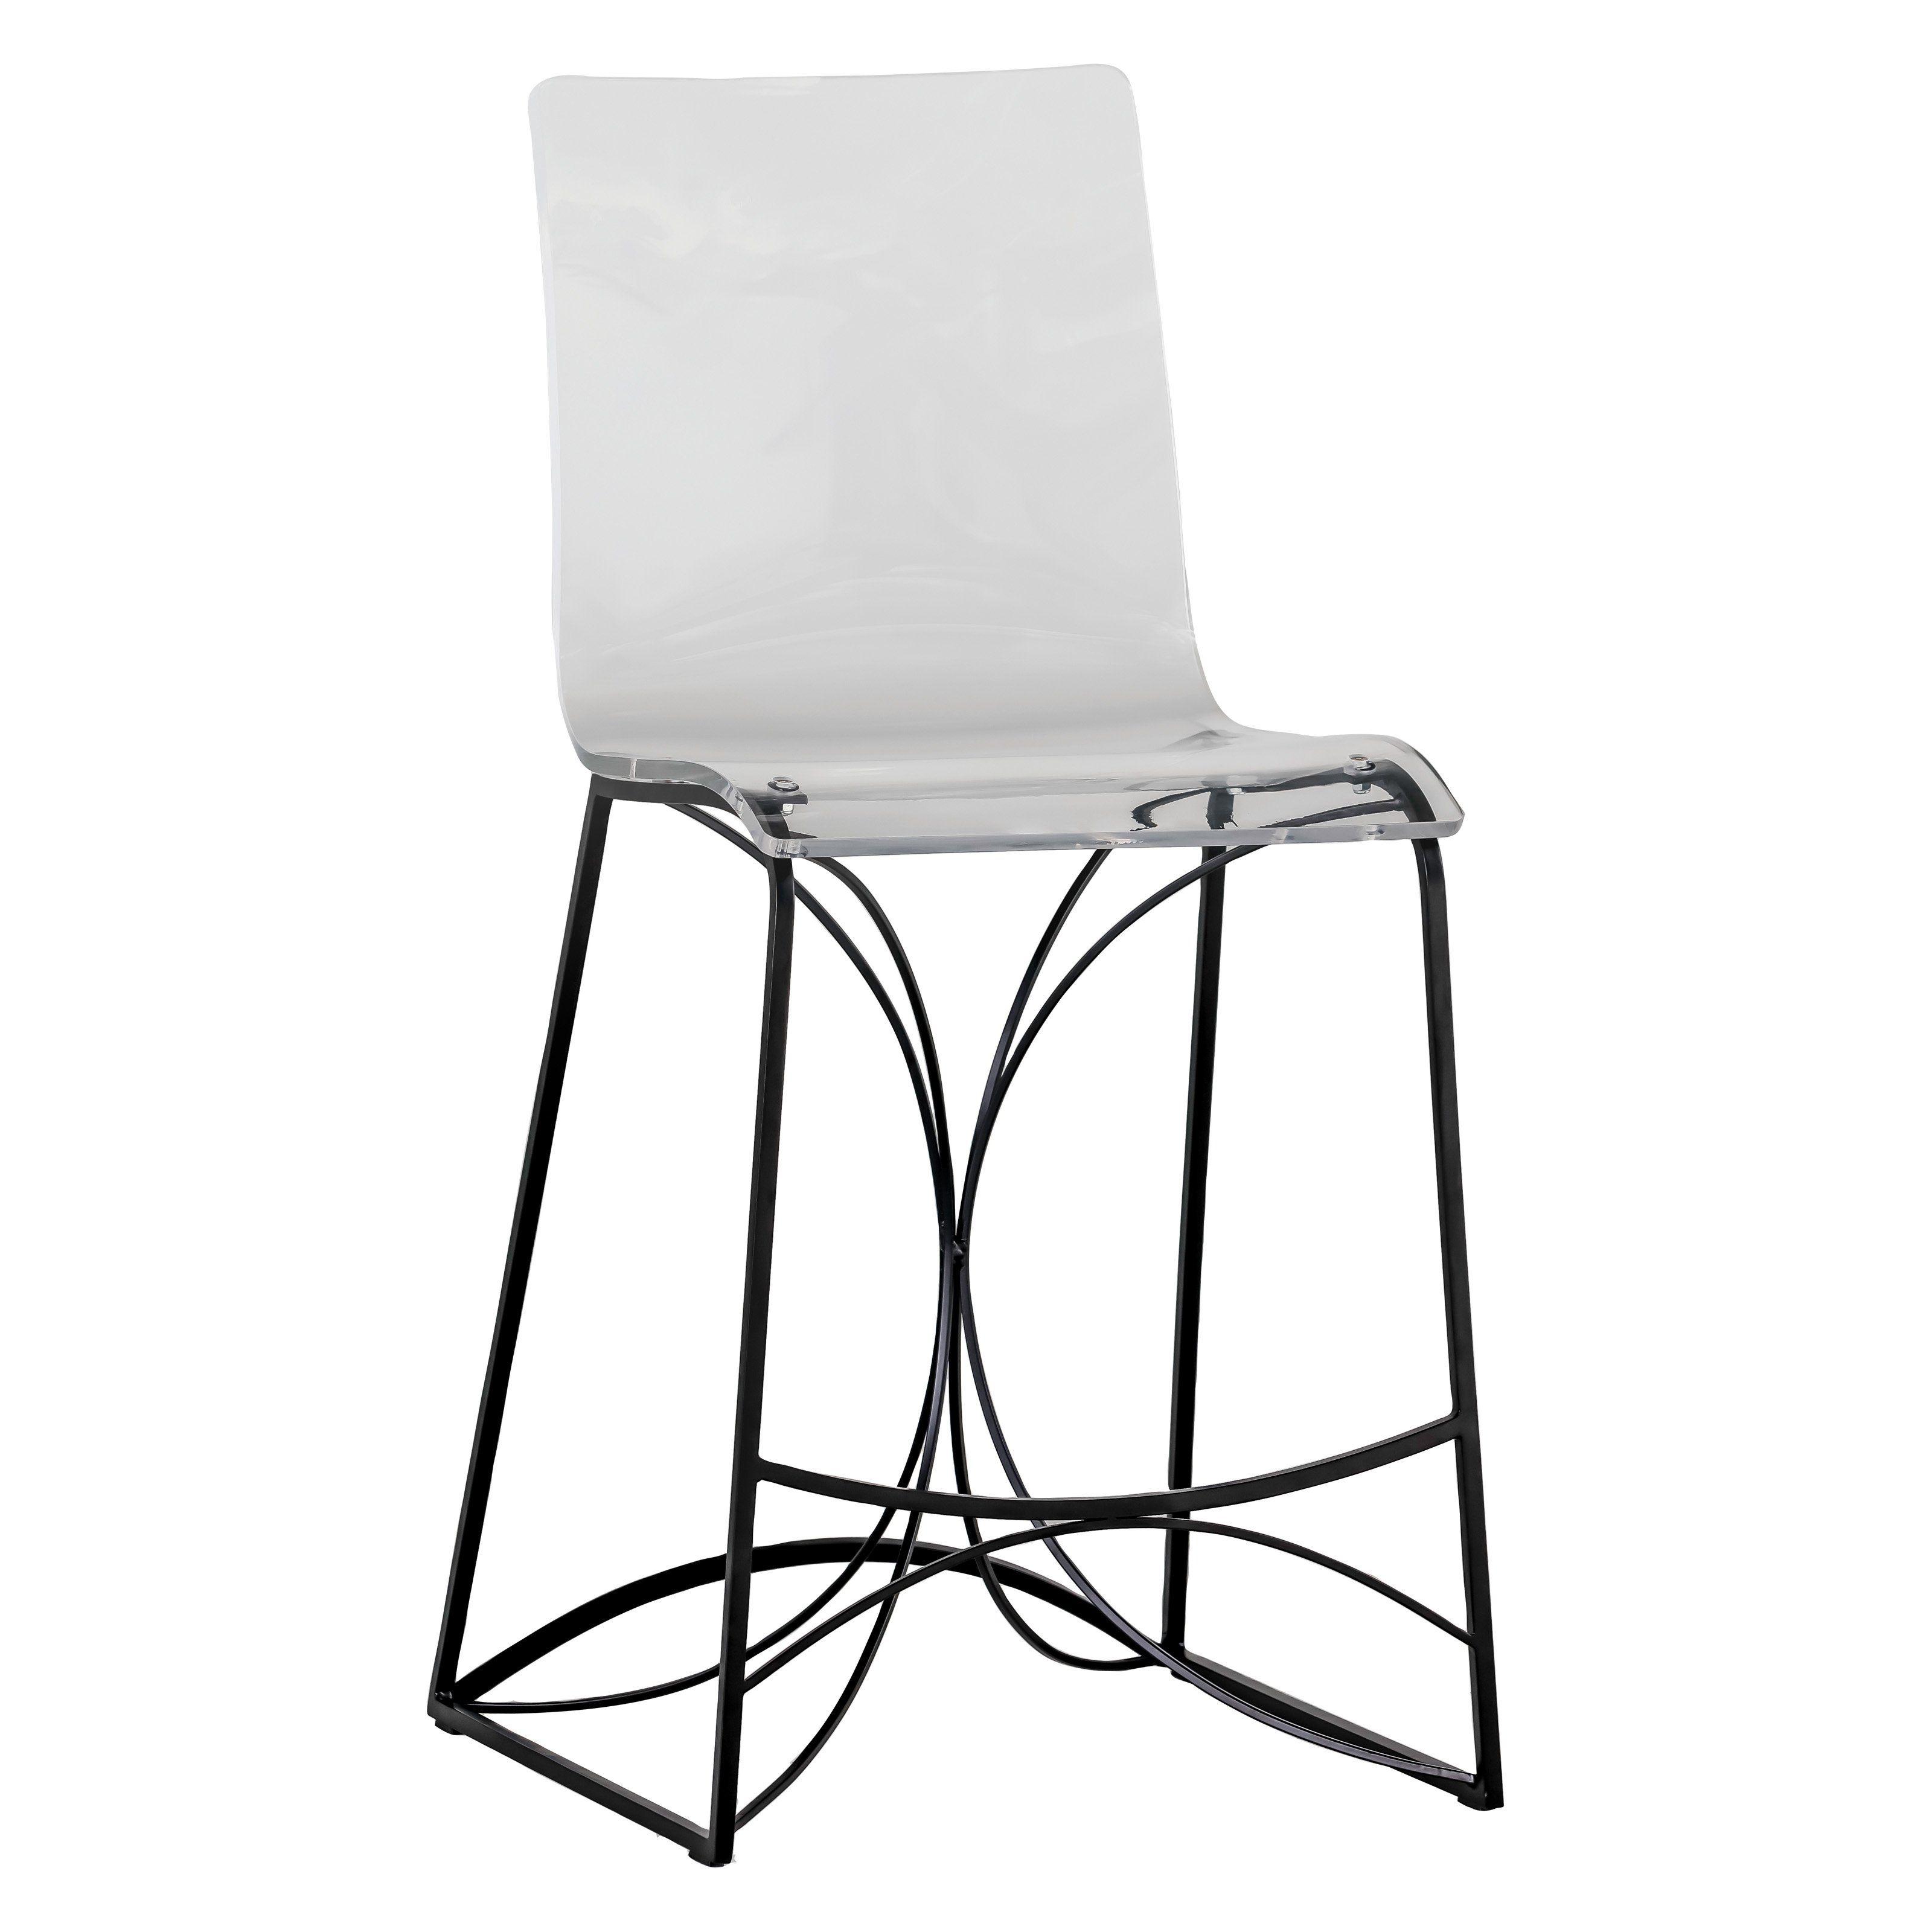 Super Gabby Angela Acrylic Counter Stool Sch 151360 Products Inzonedesignstudio Interior Chair Design Inzonedesignstudiocom